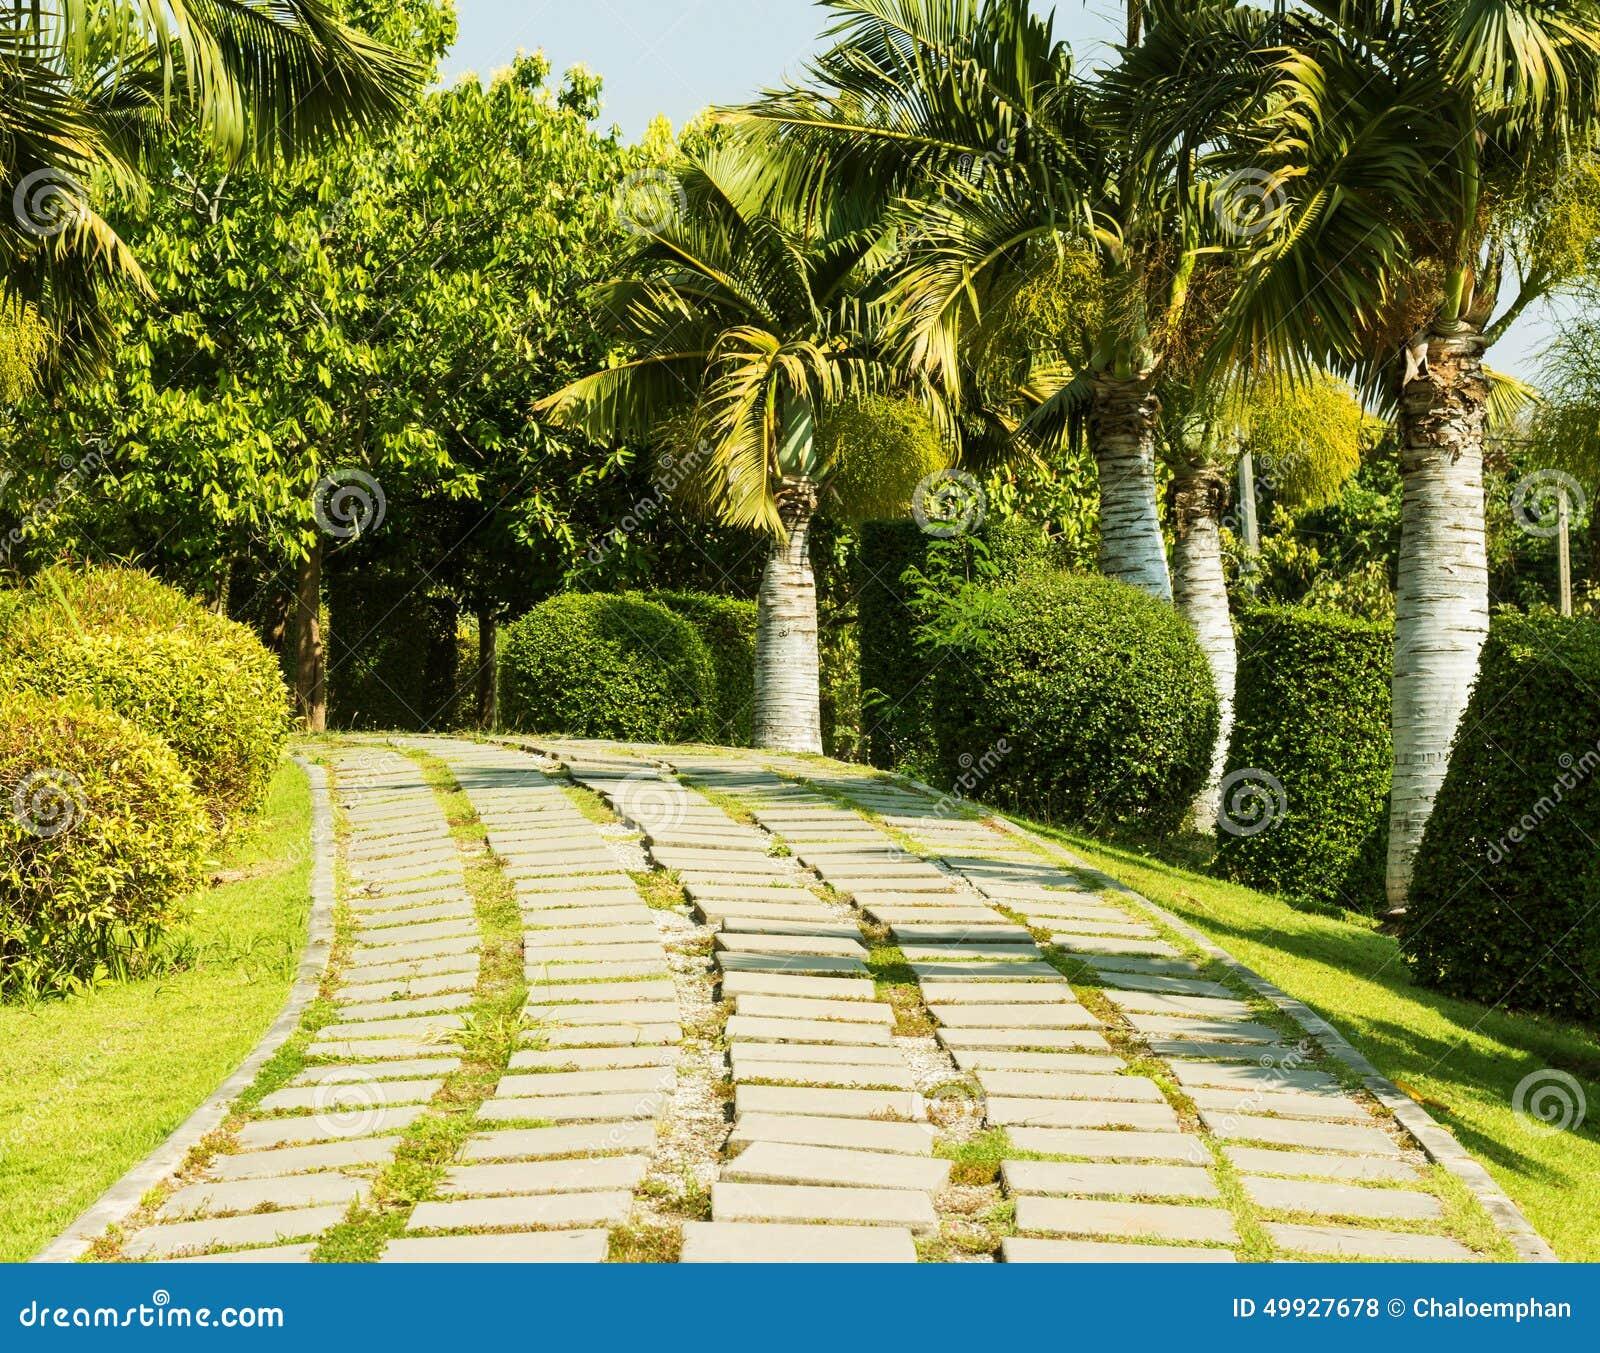 royalty free stock photo download tropical garden design